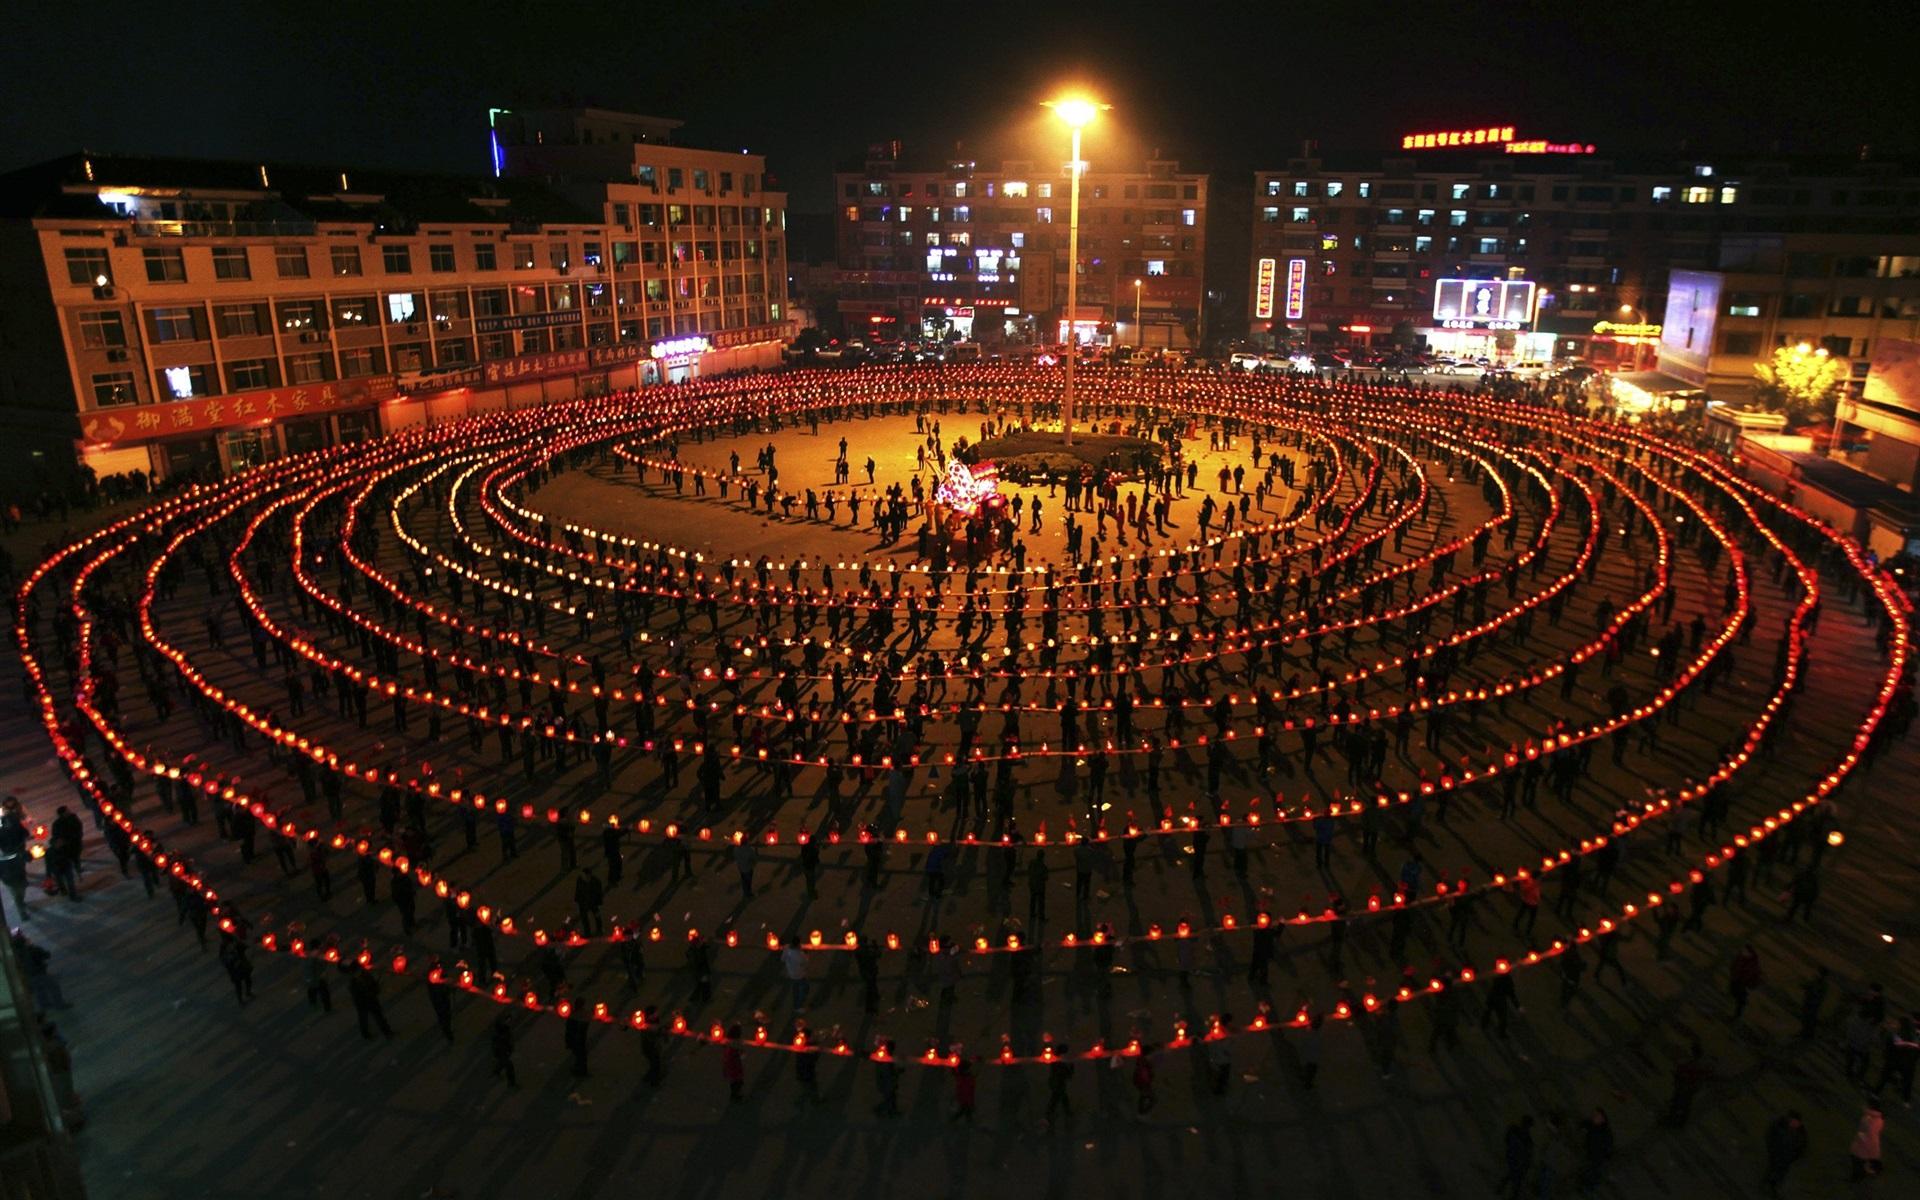 Wonderful Wallpaper Night Dragon - Lantern-Festival-China-night-Dragon-dance_1920x1200  Snapshot.jpg